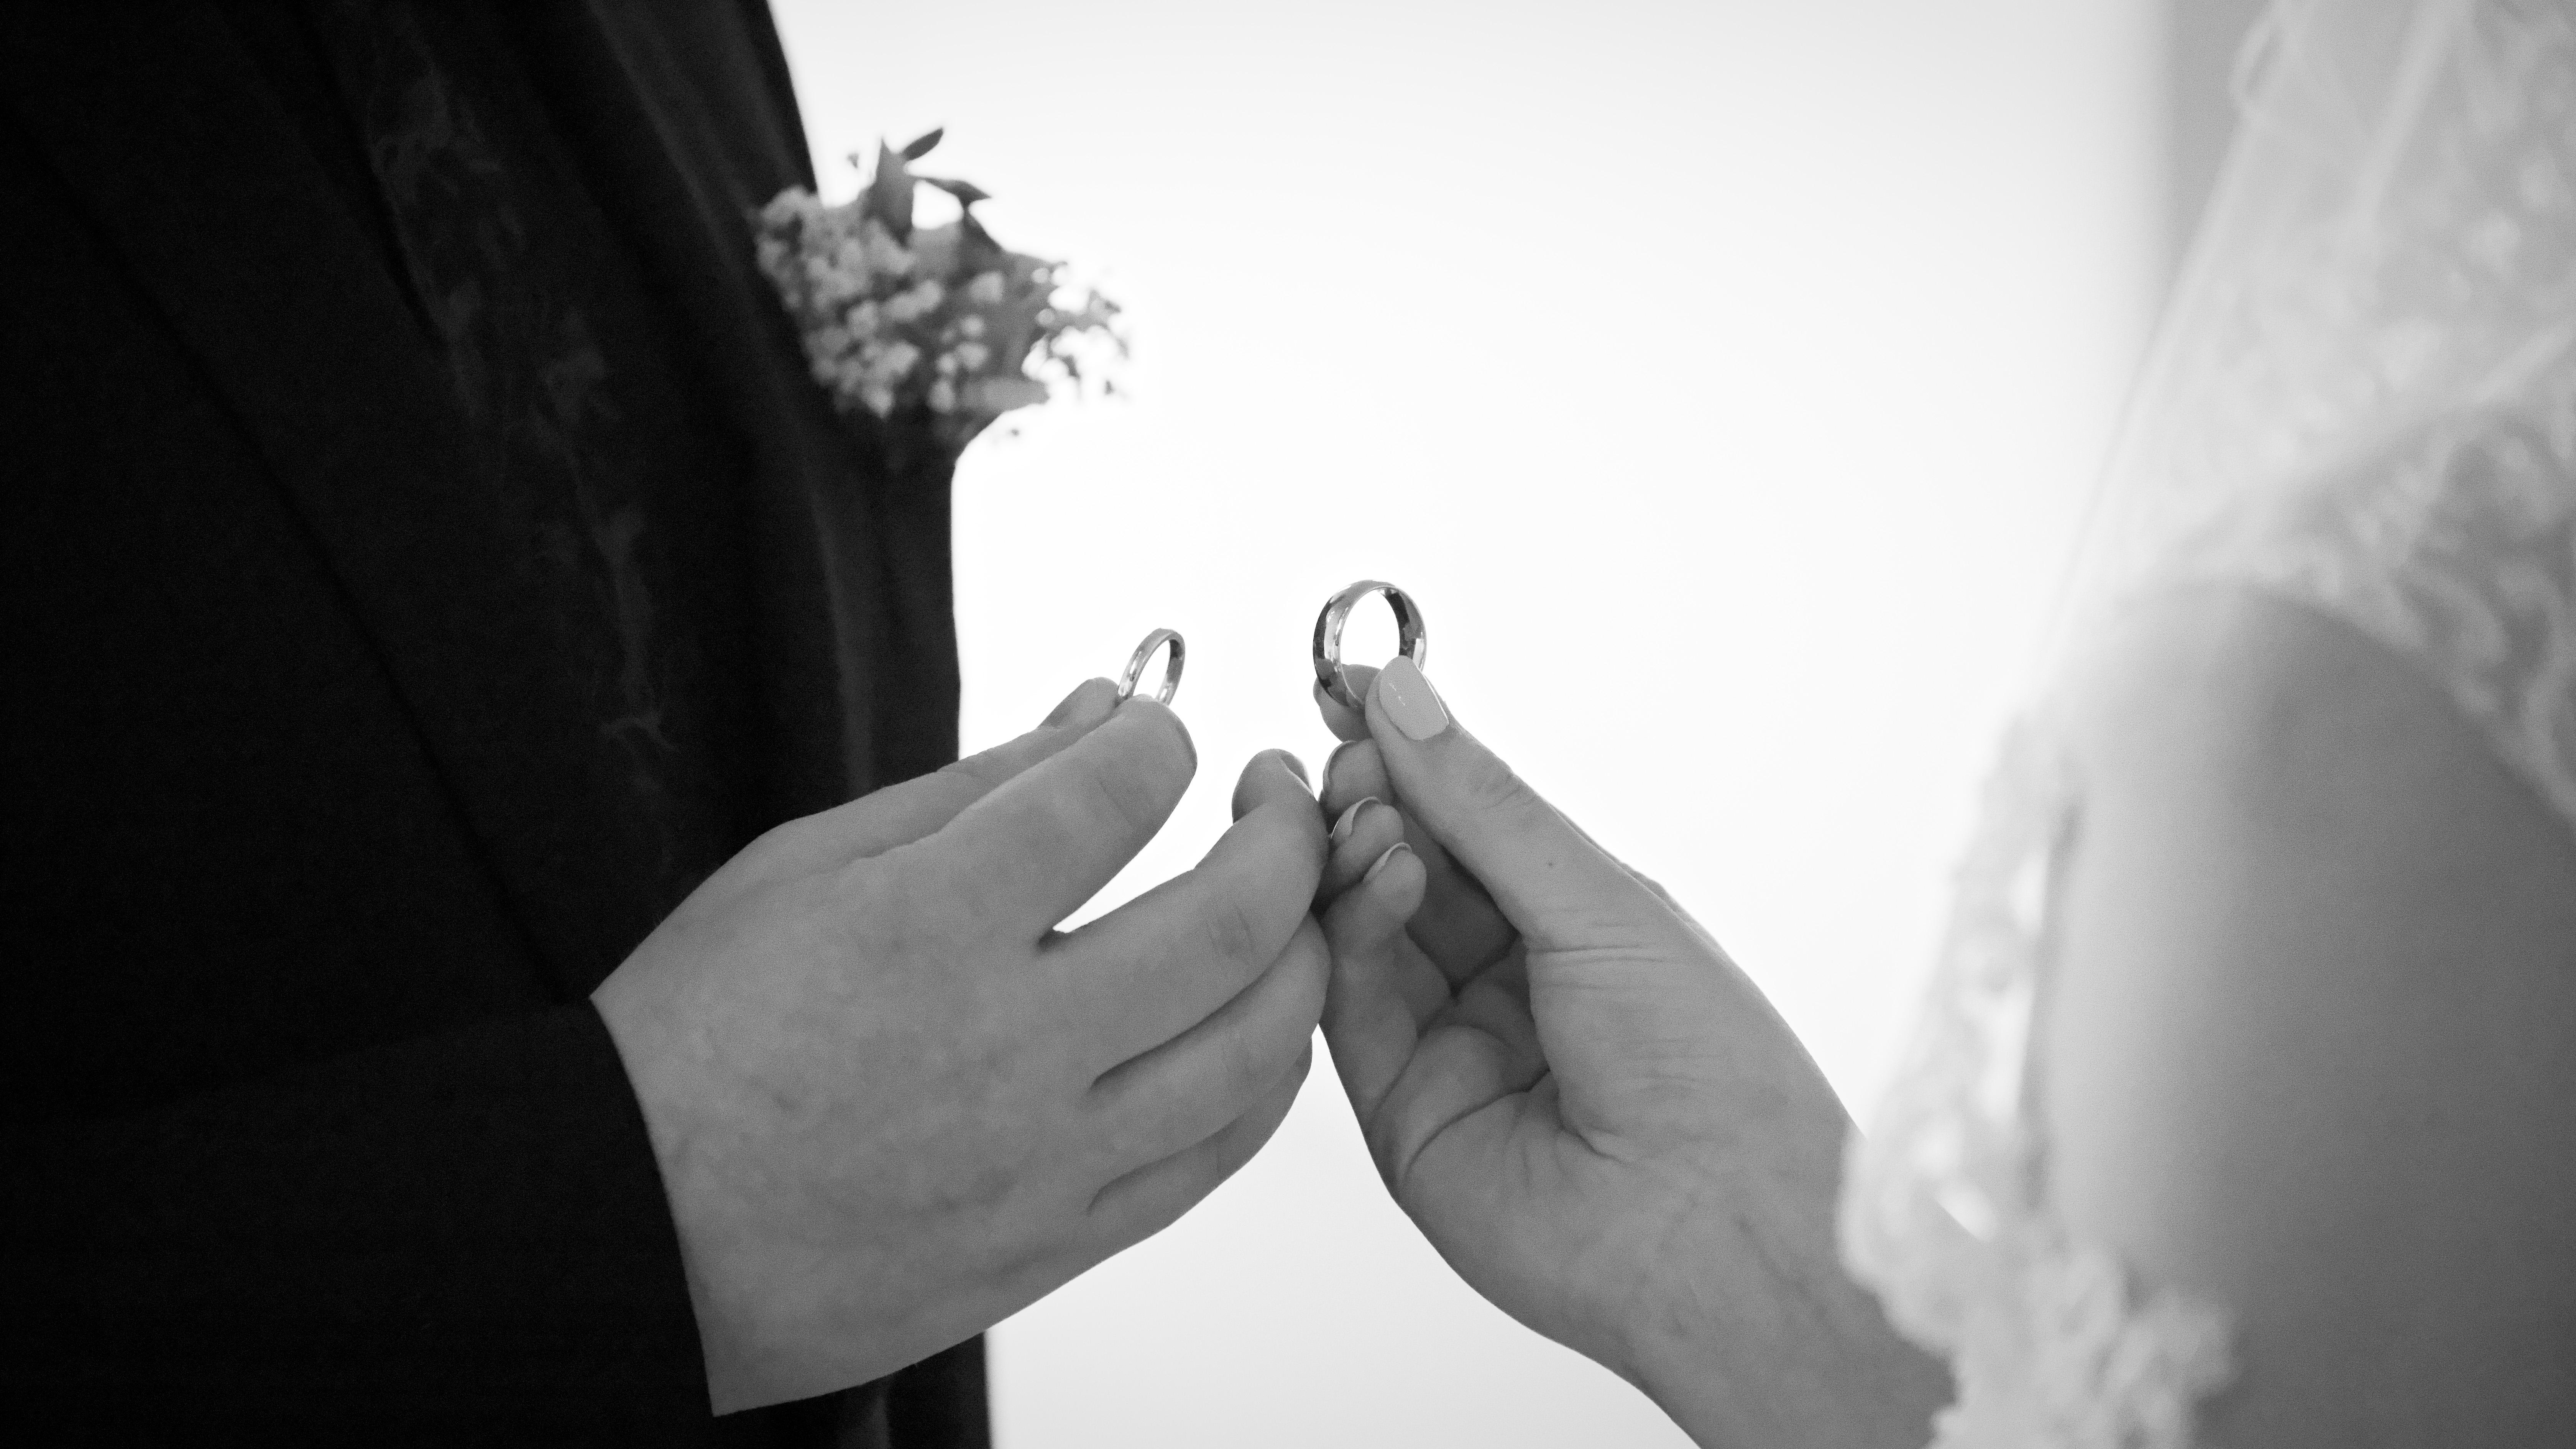 Bröllopsceremoni 2 - ringväxling